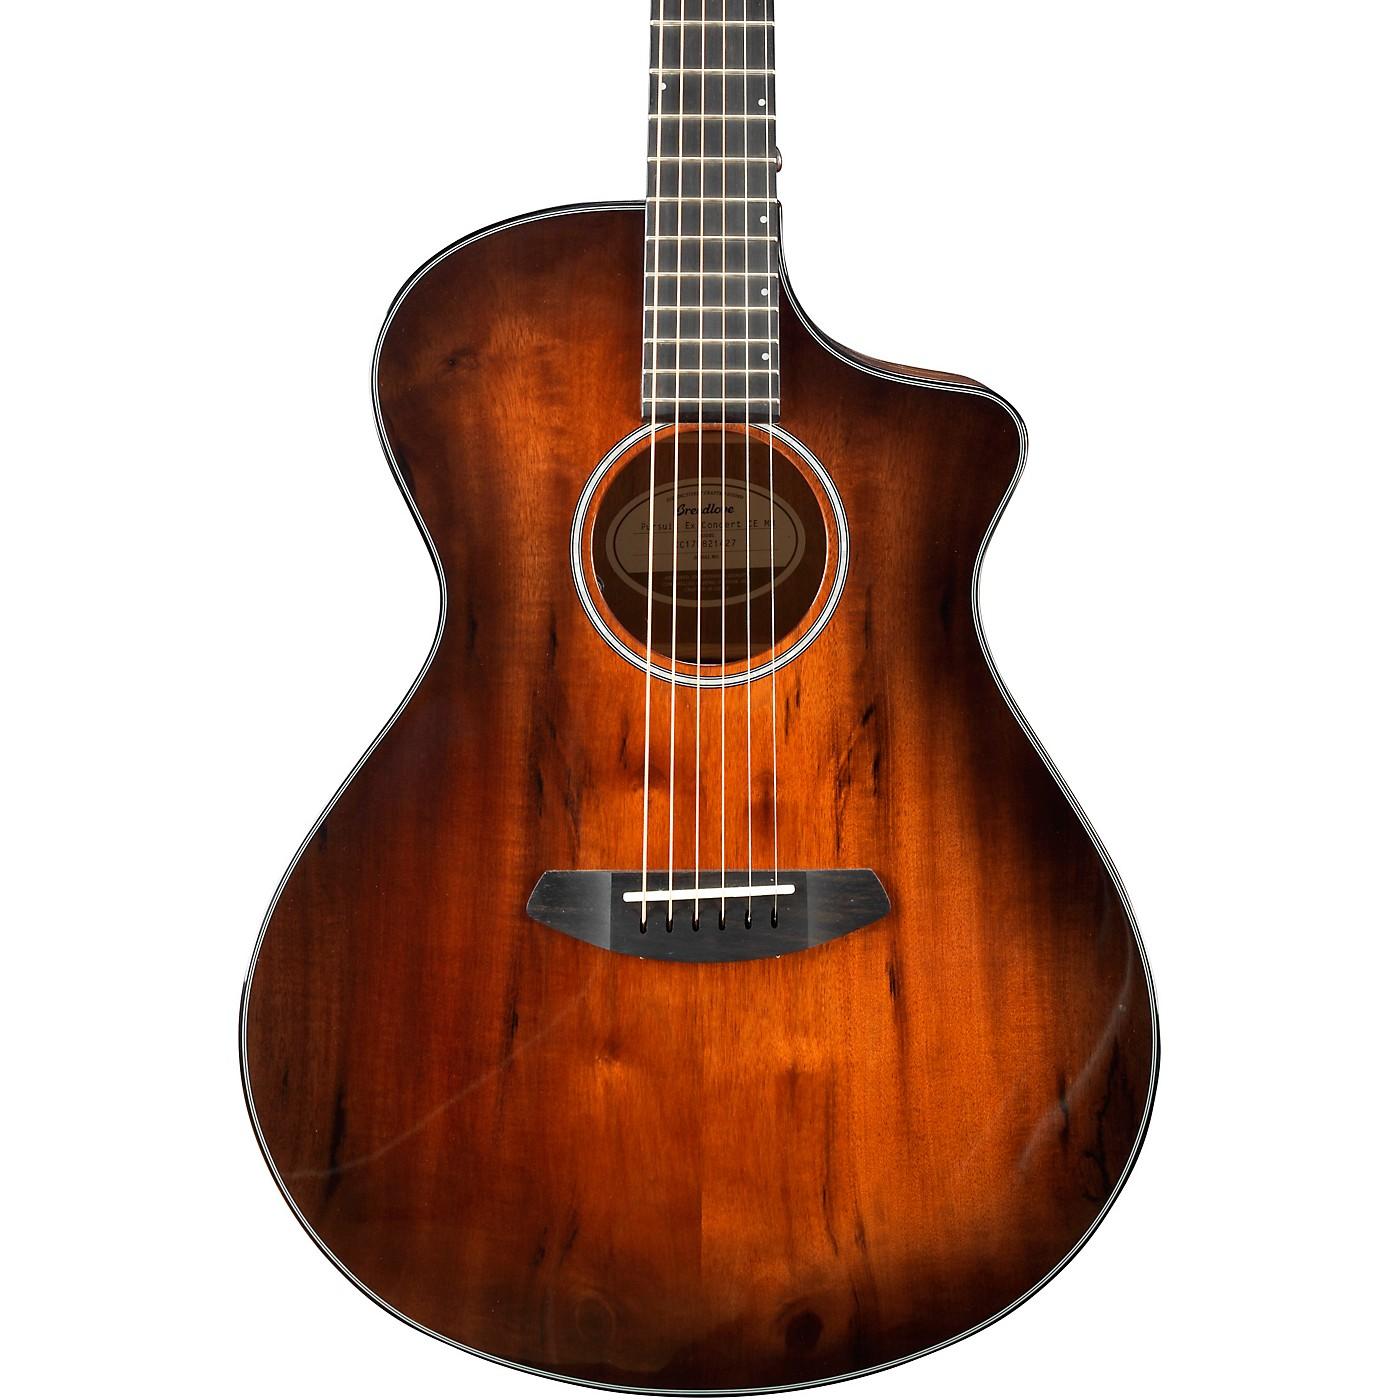 Breedlove Pursuit Exotic Concert Cutaway CE Myrtlewood Acoustic-Electric Guitar thumbnail